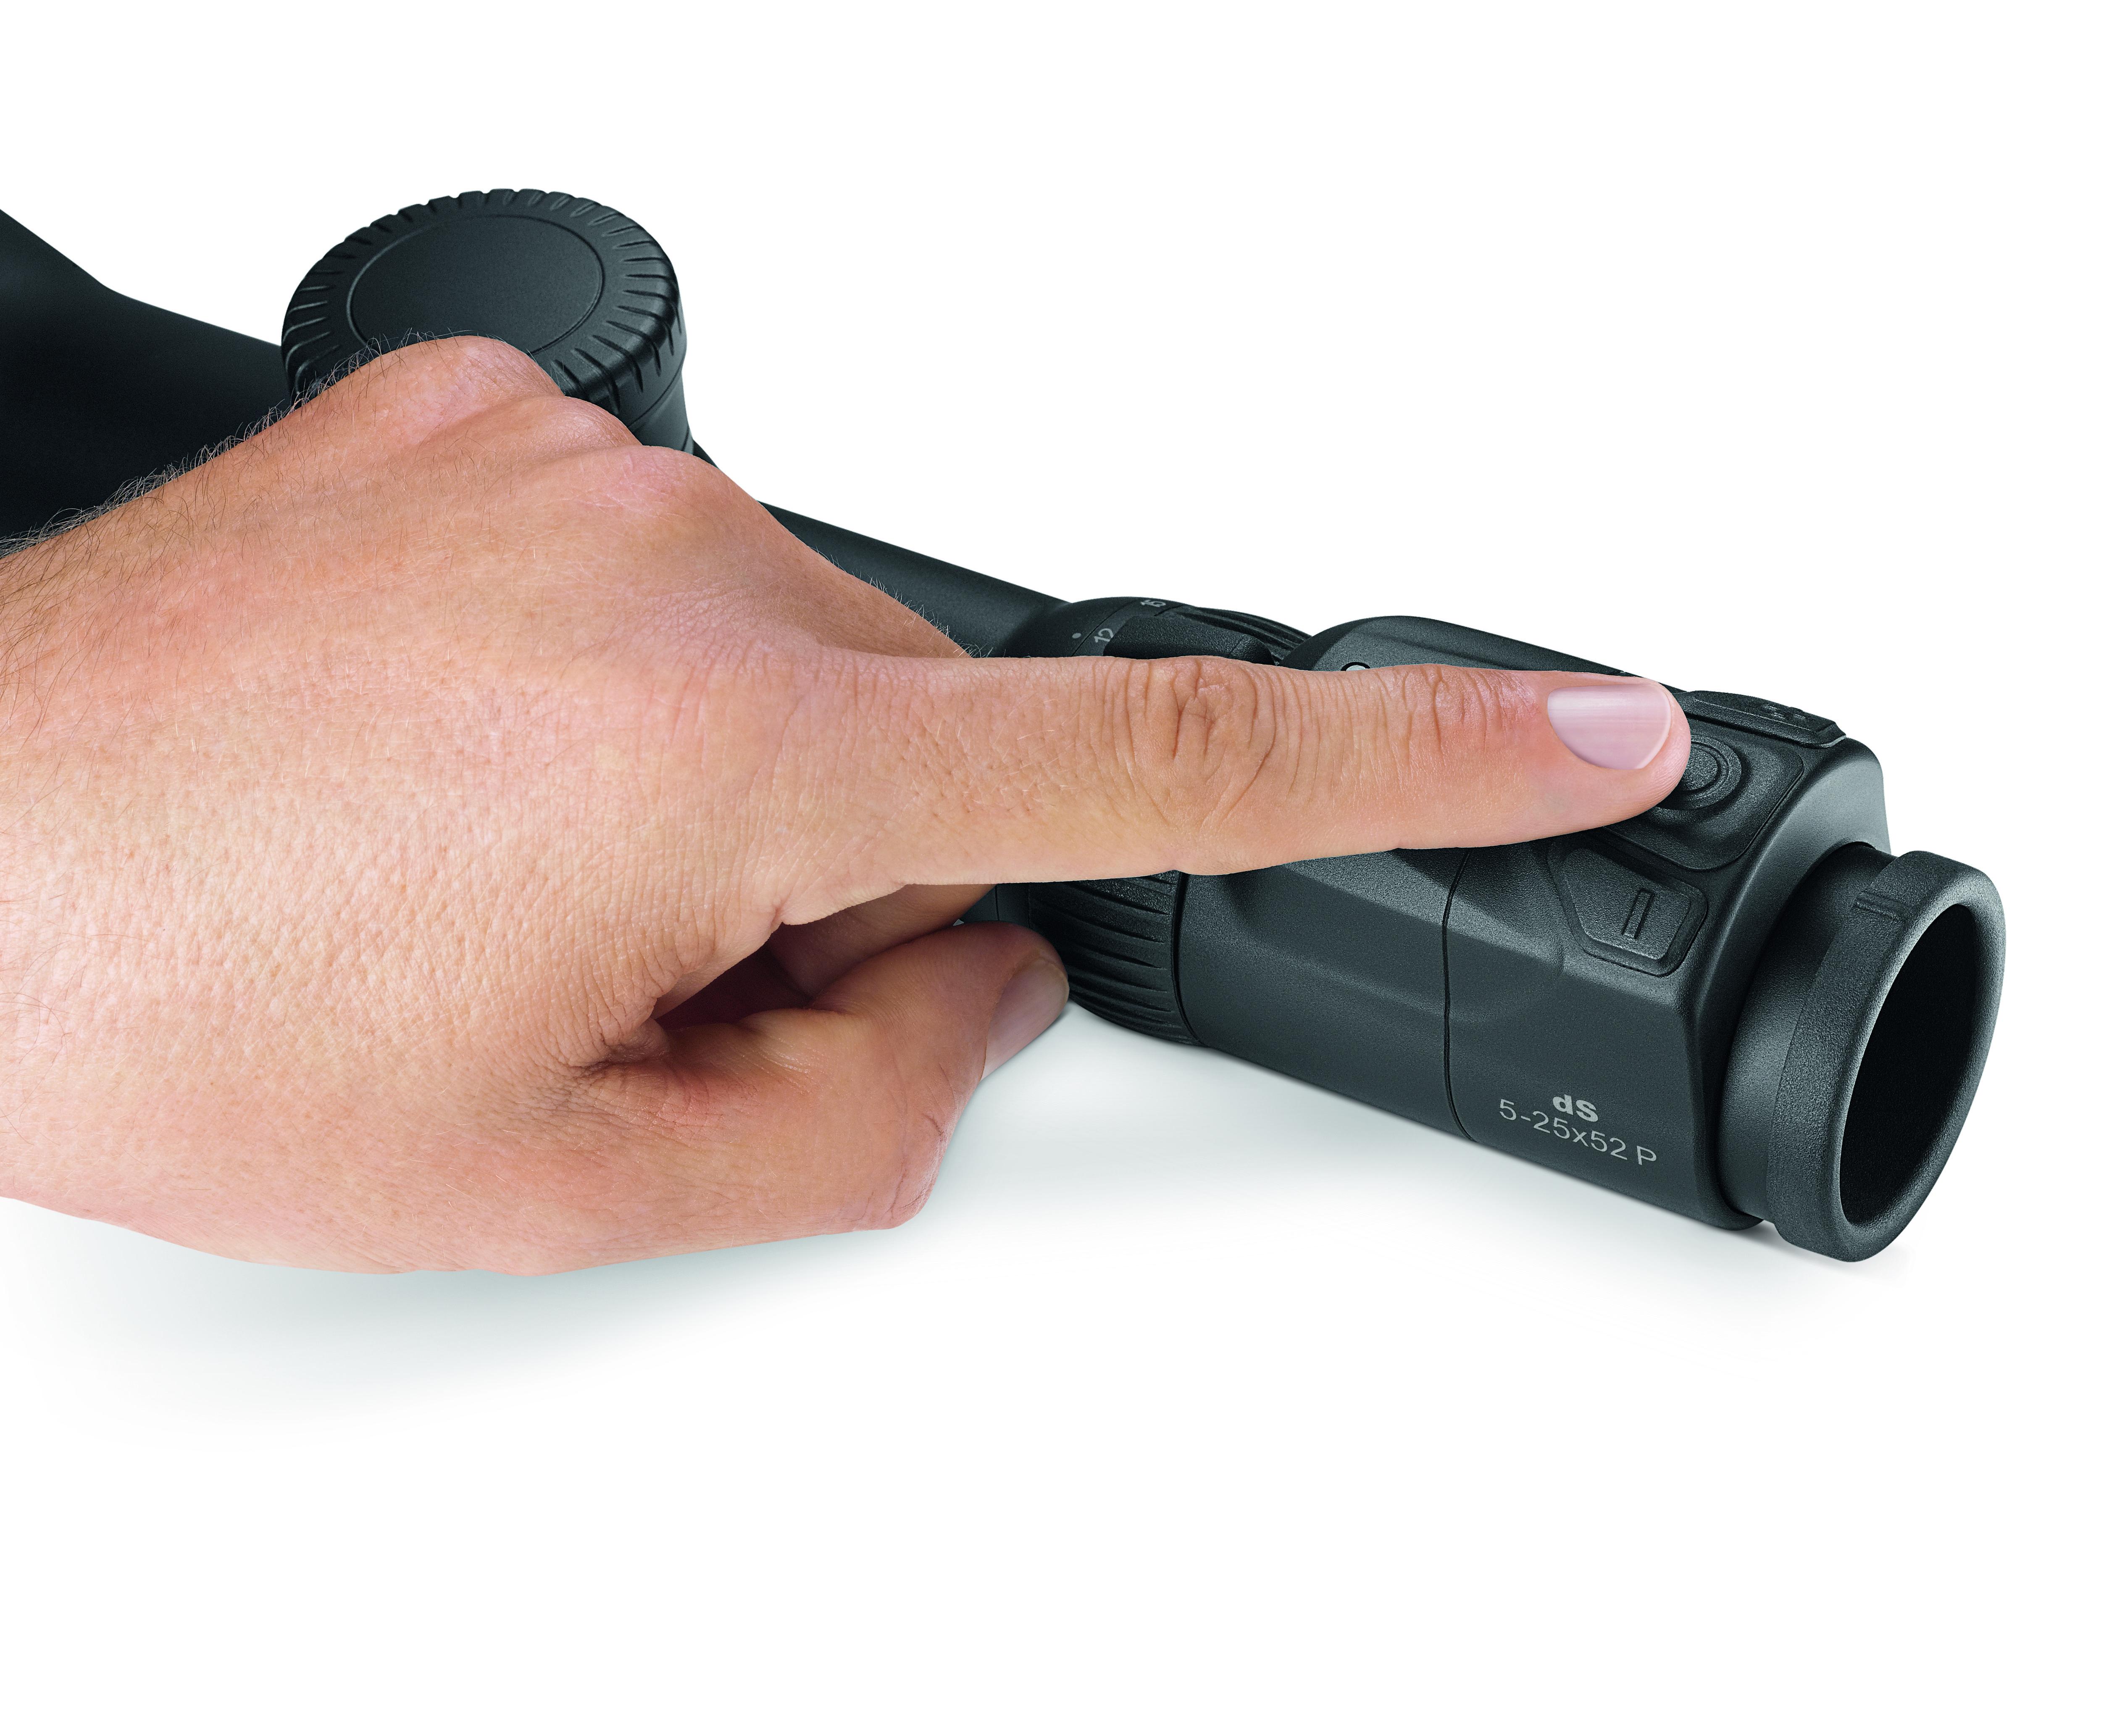 Entfernungsmesser Swarovski : Fernglas swarovski entfernungsmesser optik u ferngläser